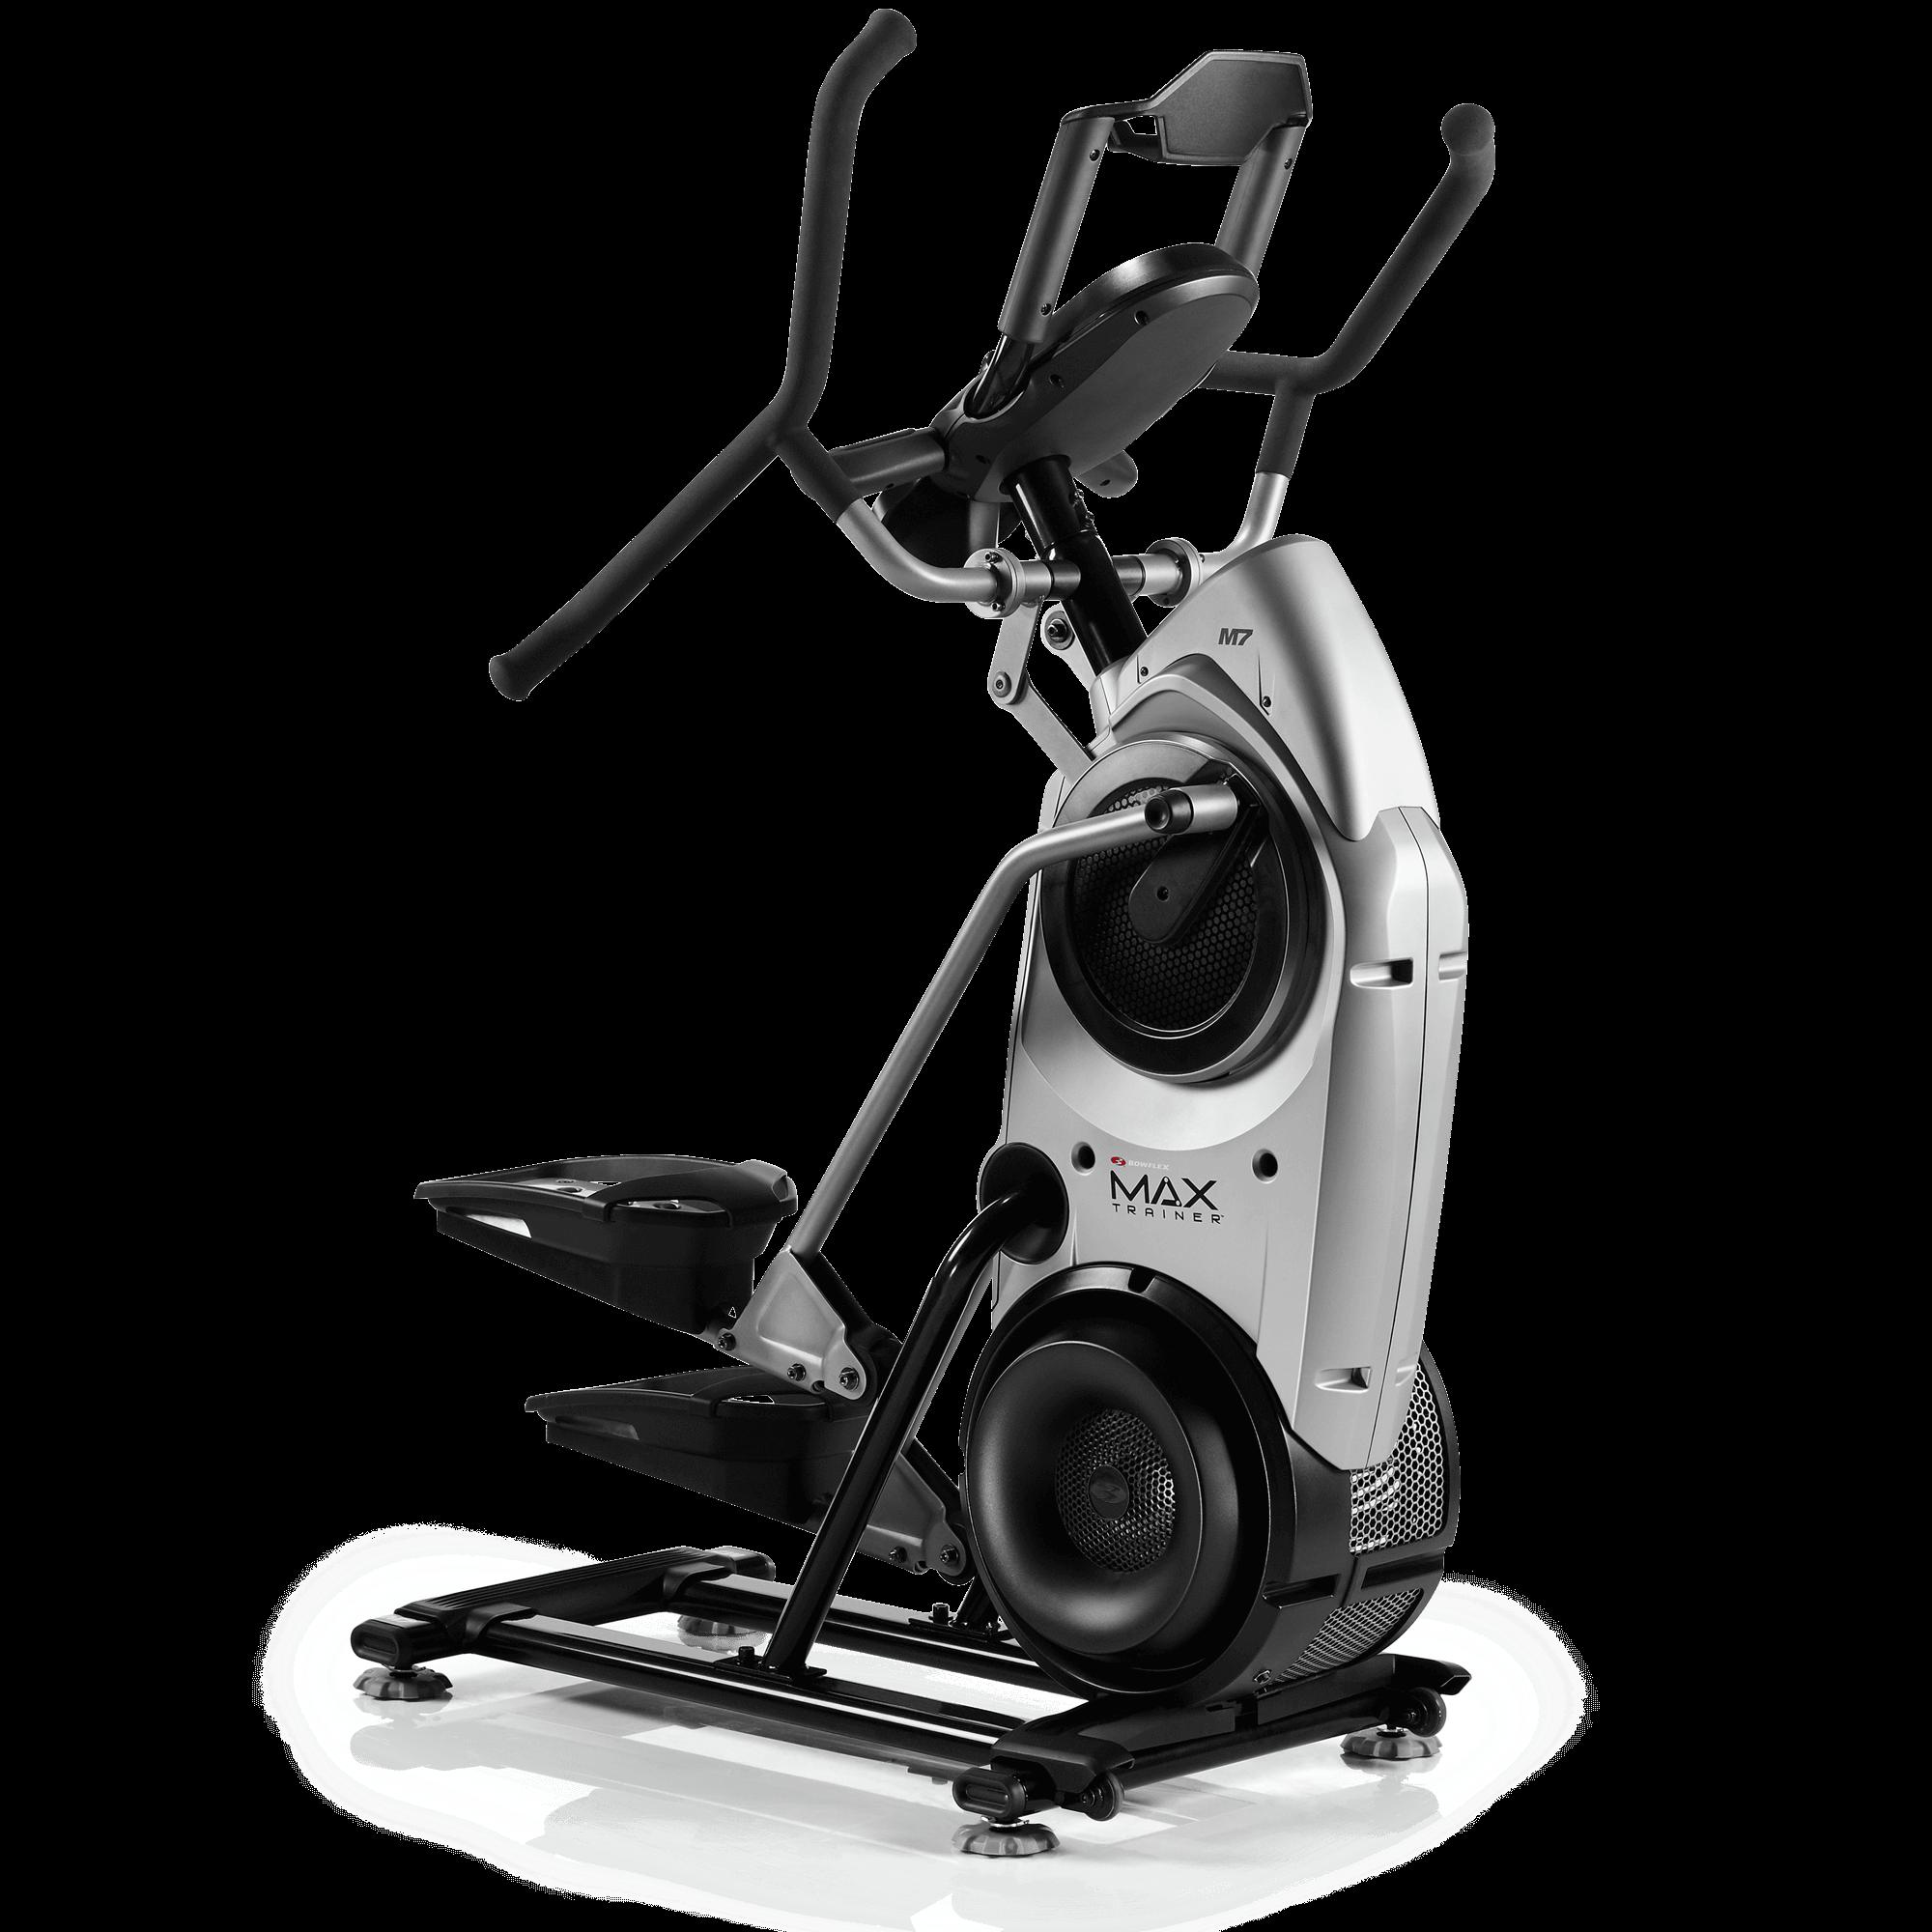 Bowflex Max Trainer M7 | Bowflex